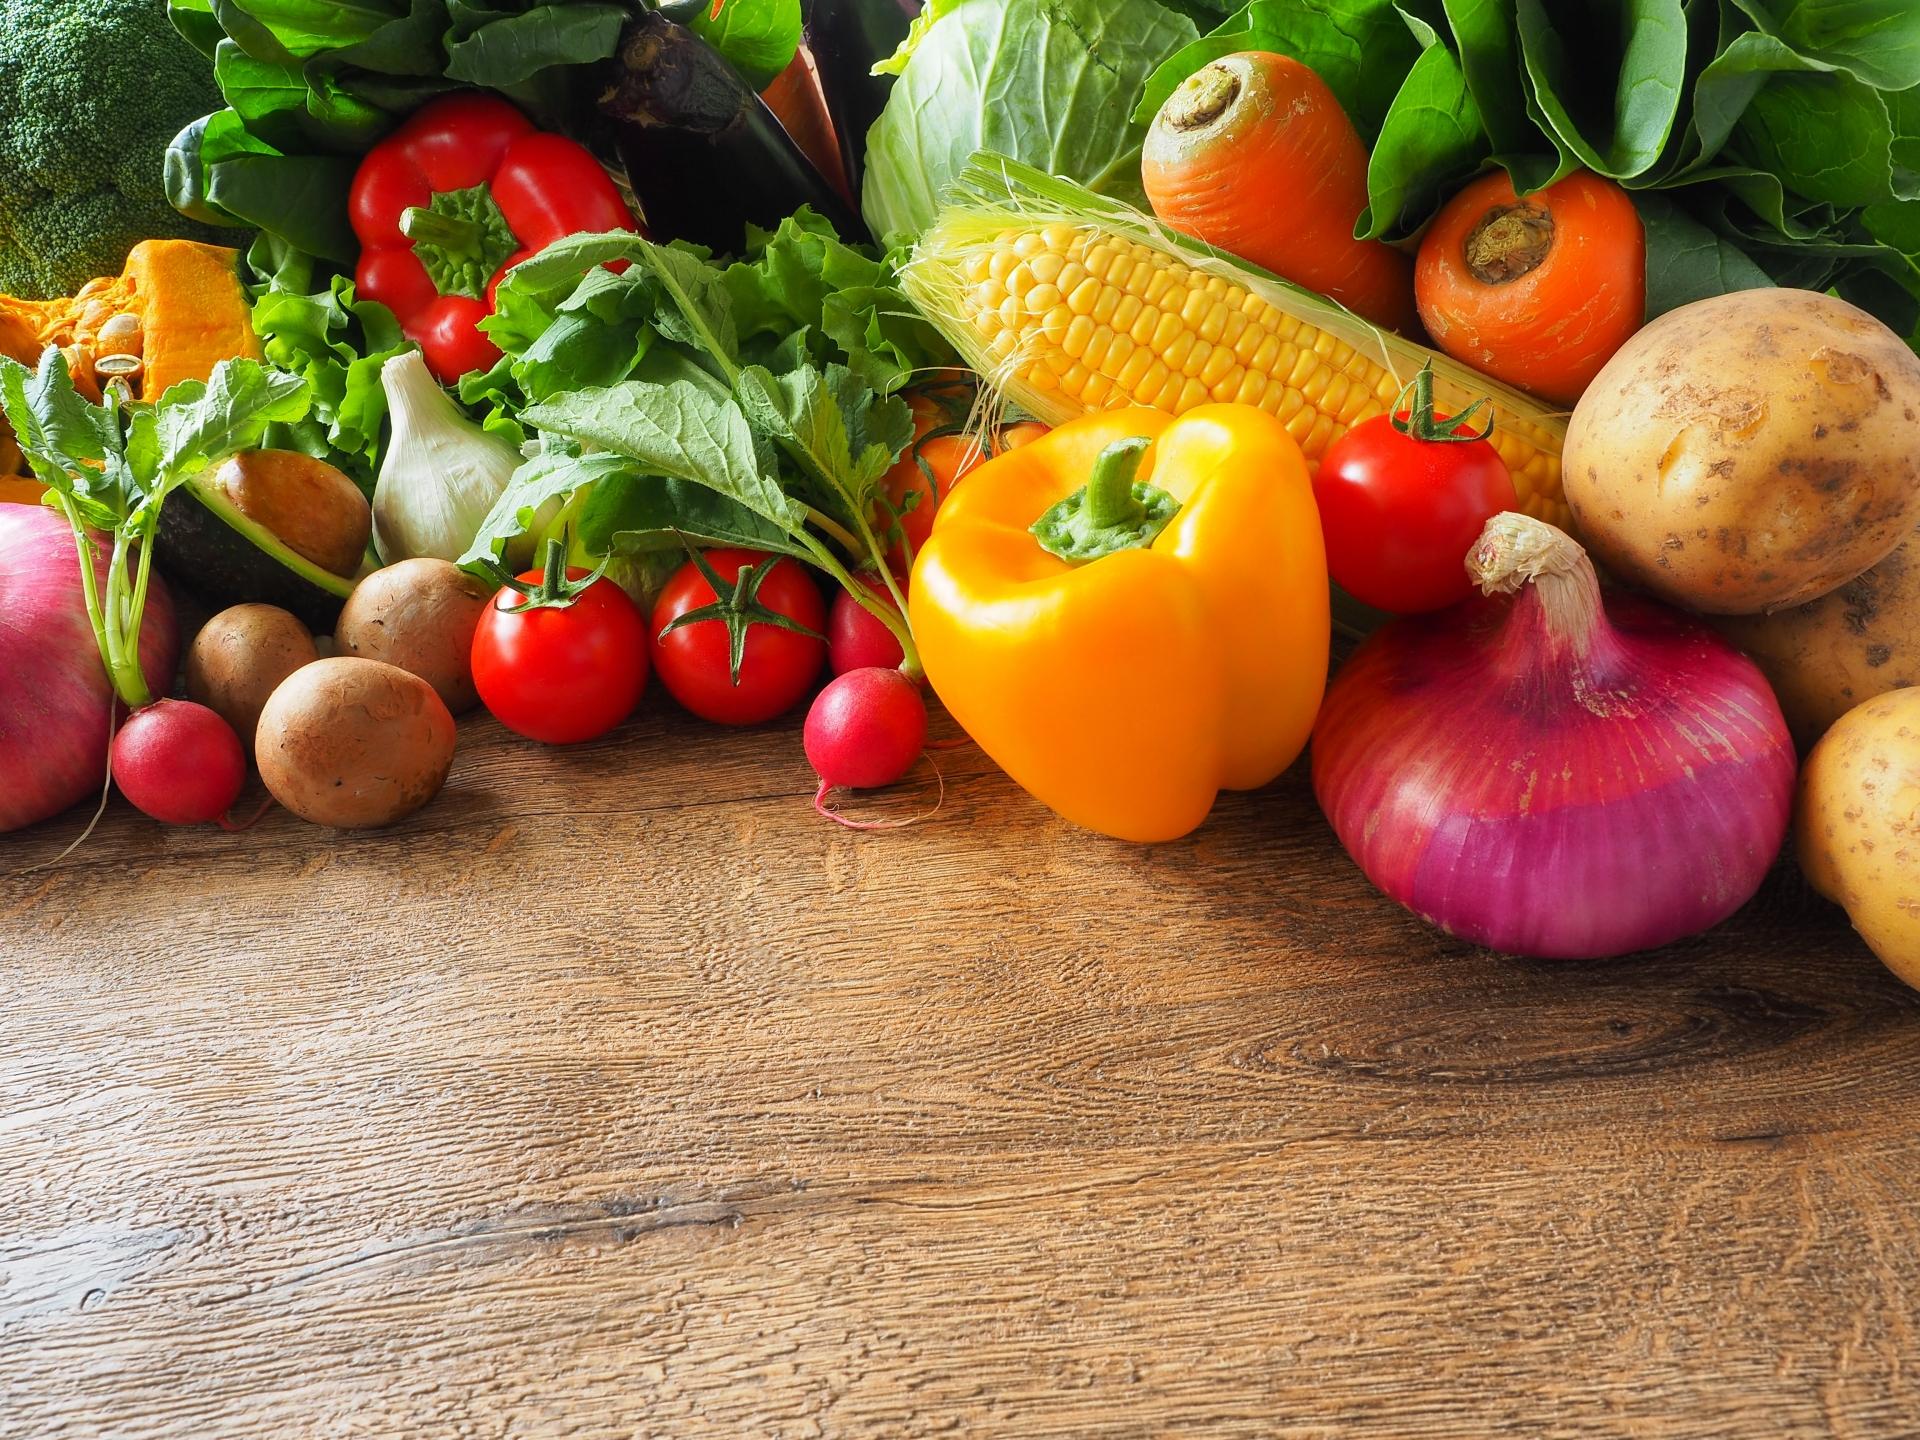 【活用事例】IoTによる食品衛生法改正・HACCP対応 温度管理・帳票作成を自動化